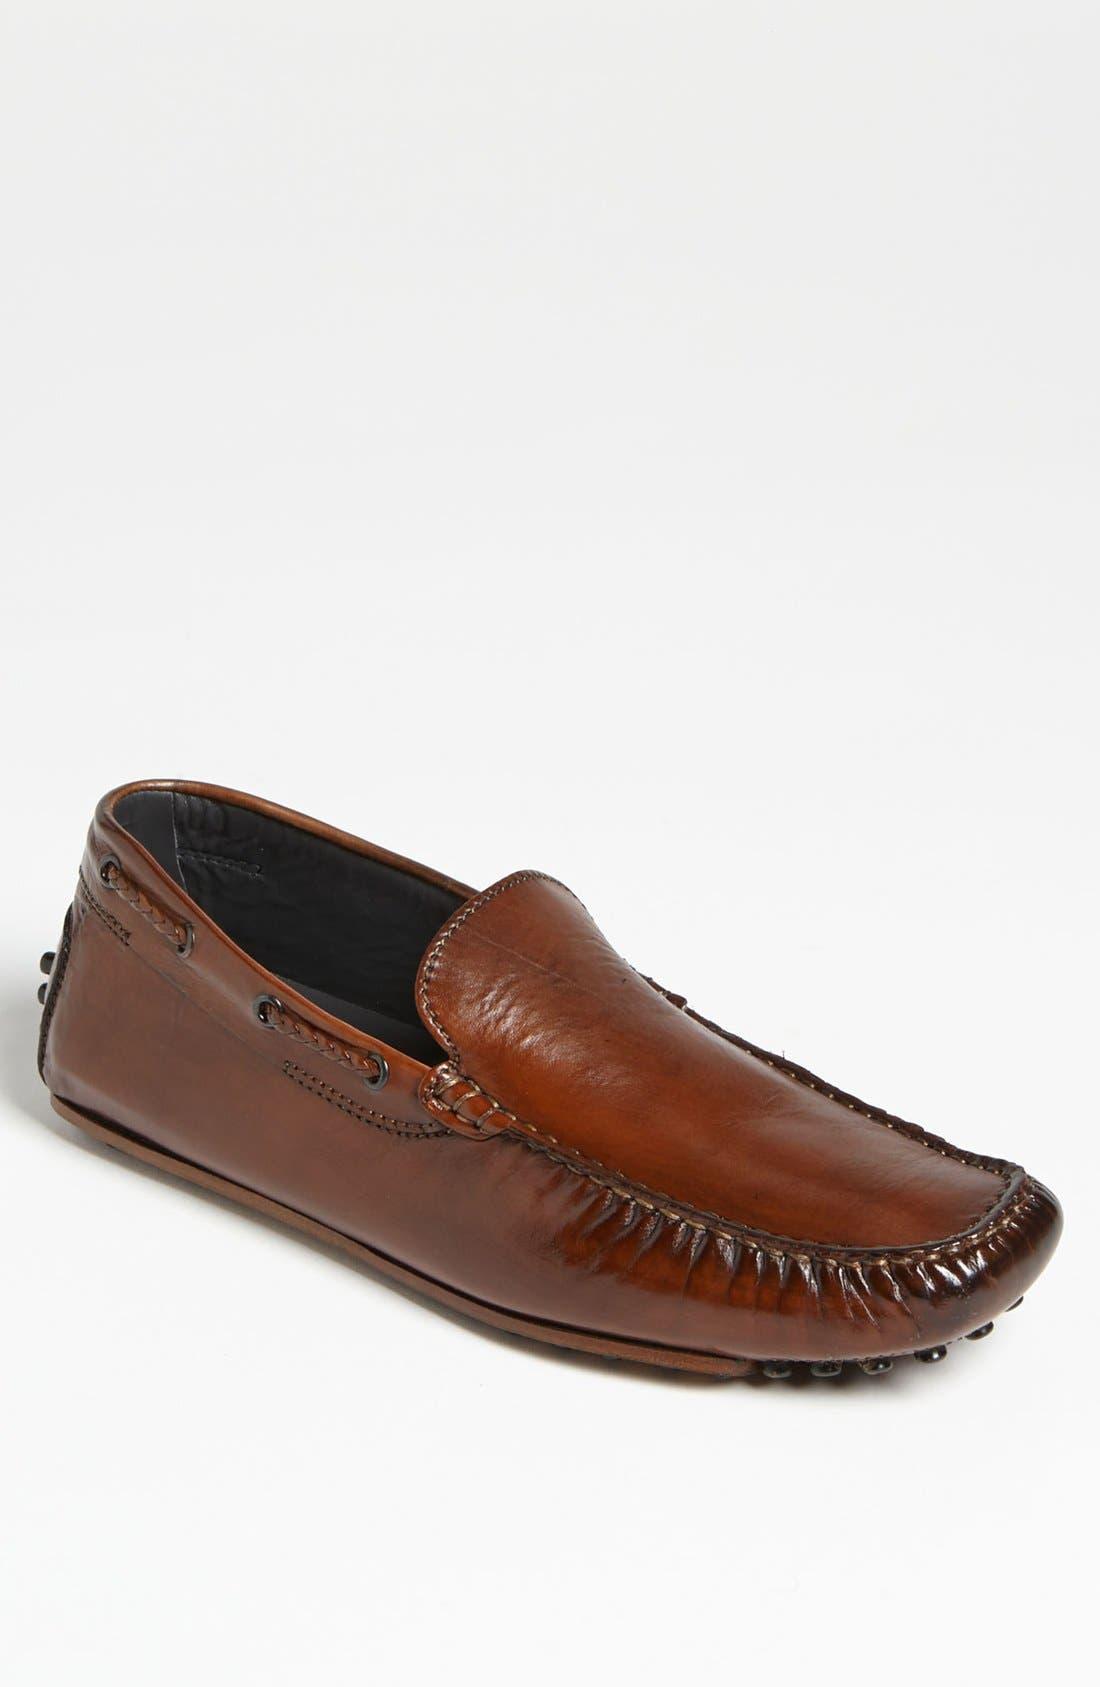 Main Image - To Boot New York 'Trumball' Driving Shoe